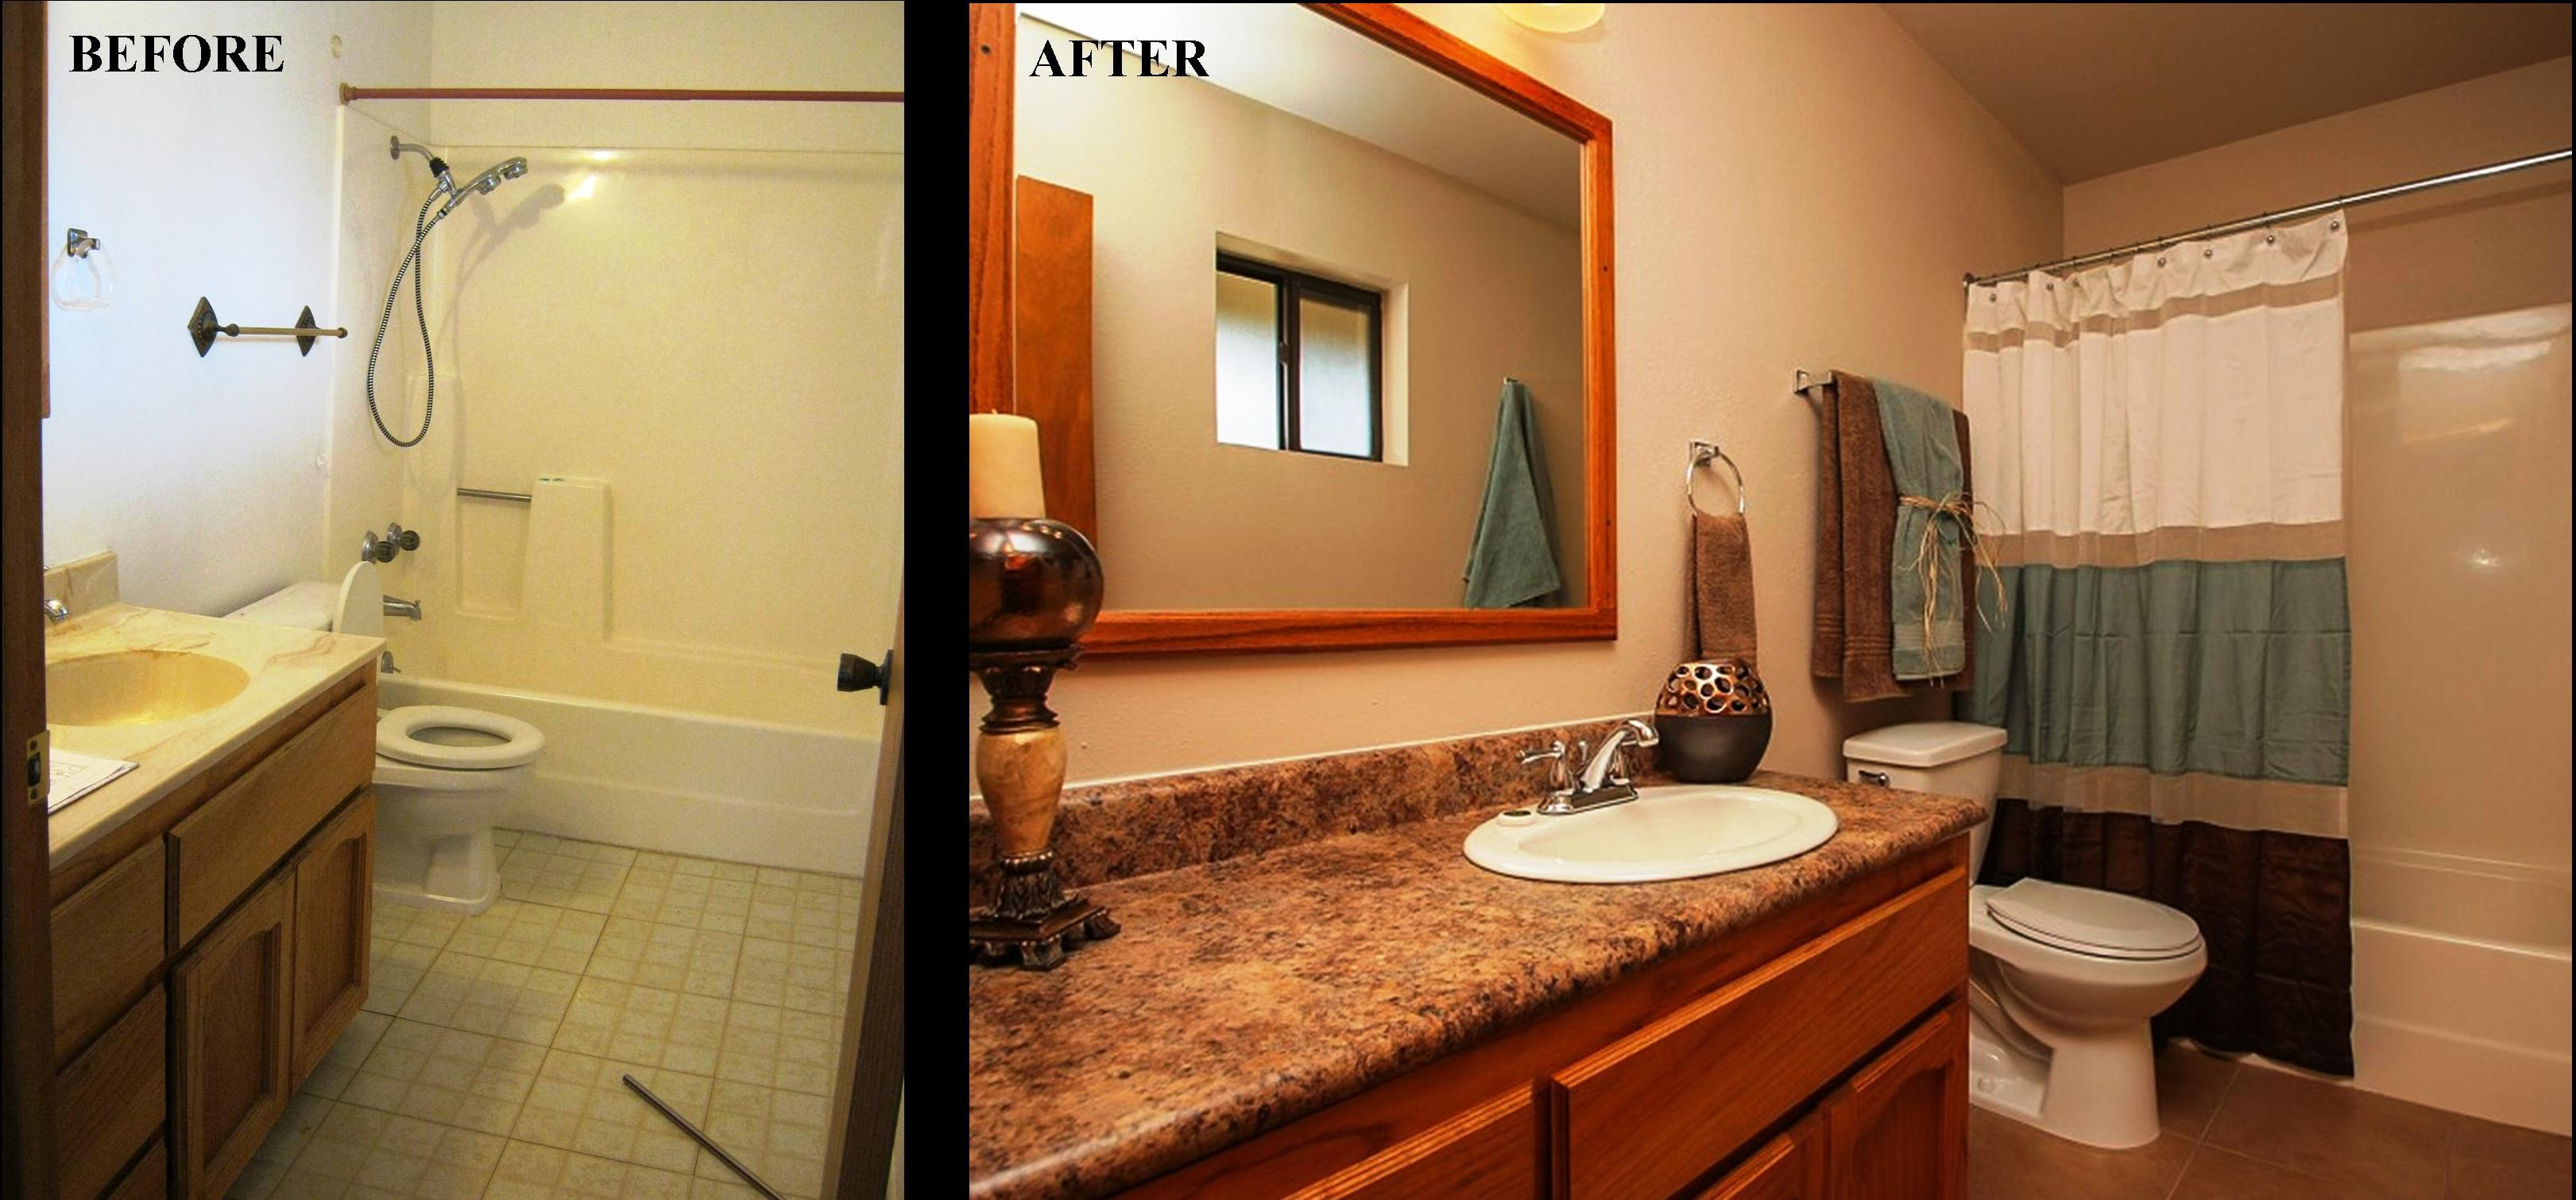 Bathroom Remodel Kitchen Remodel NJ Builders Inc - Bathroom remodel prescott az